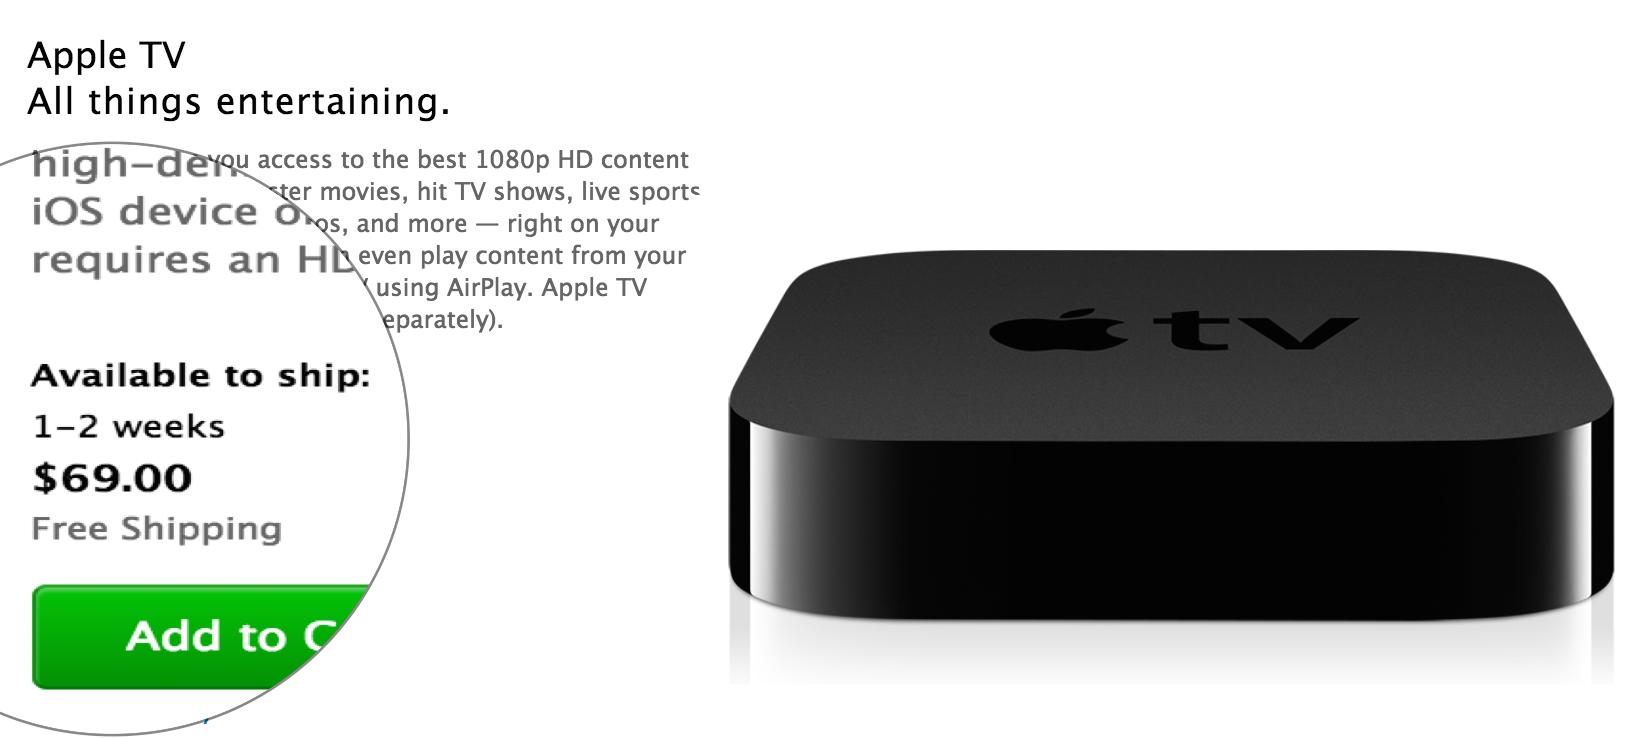 apple-tv-ship